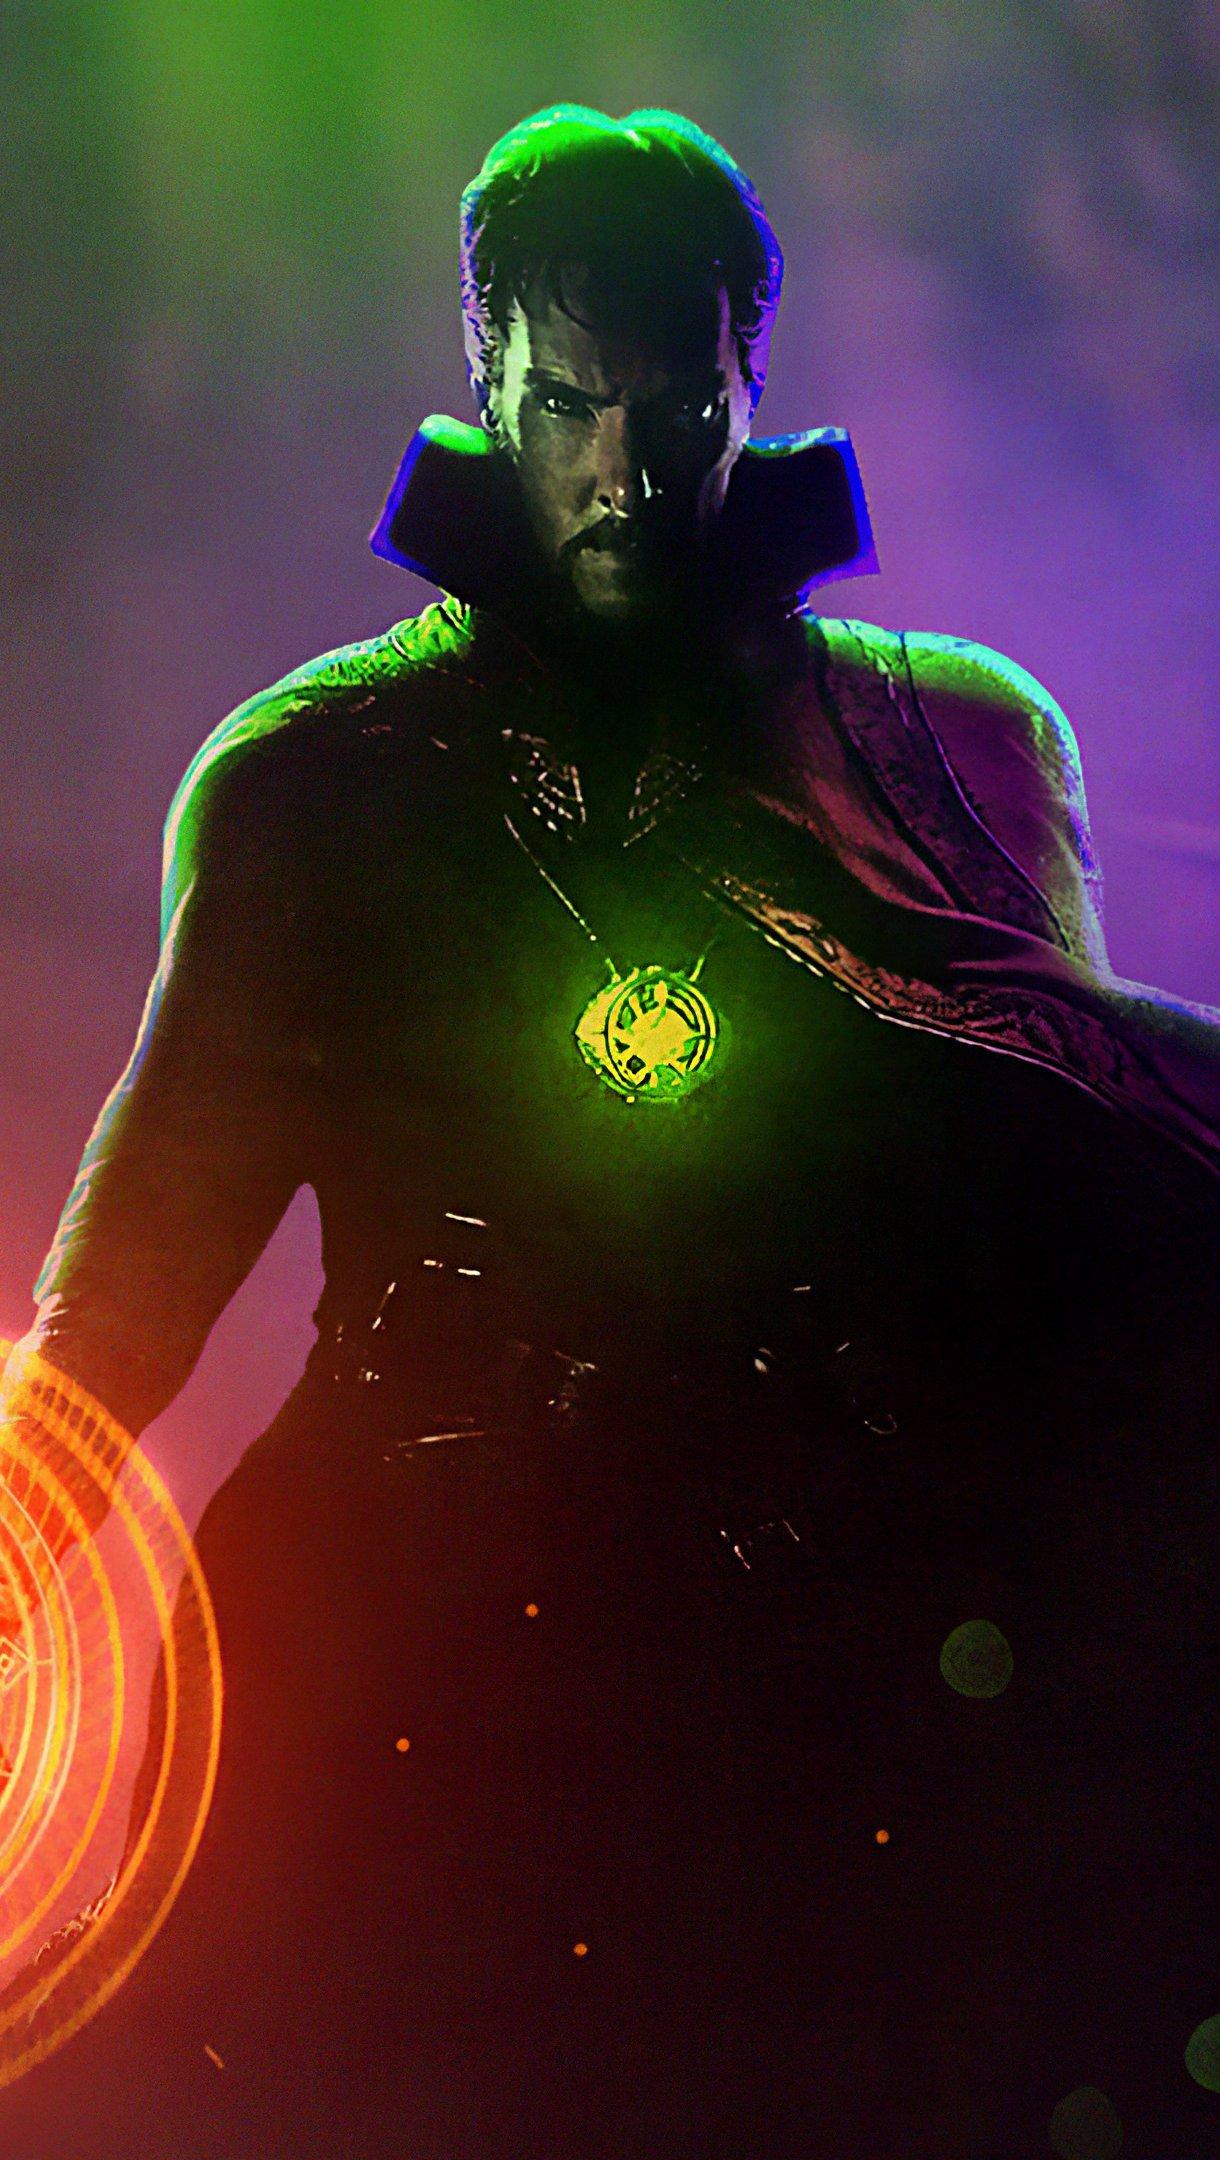 Fondos de pantalla Doctor Strange Artwork Vertical